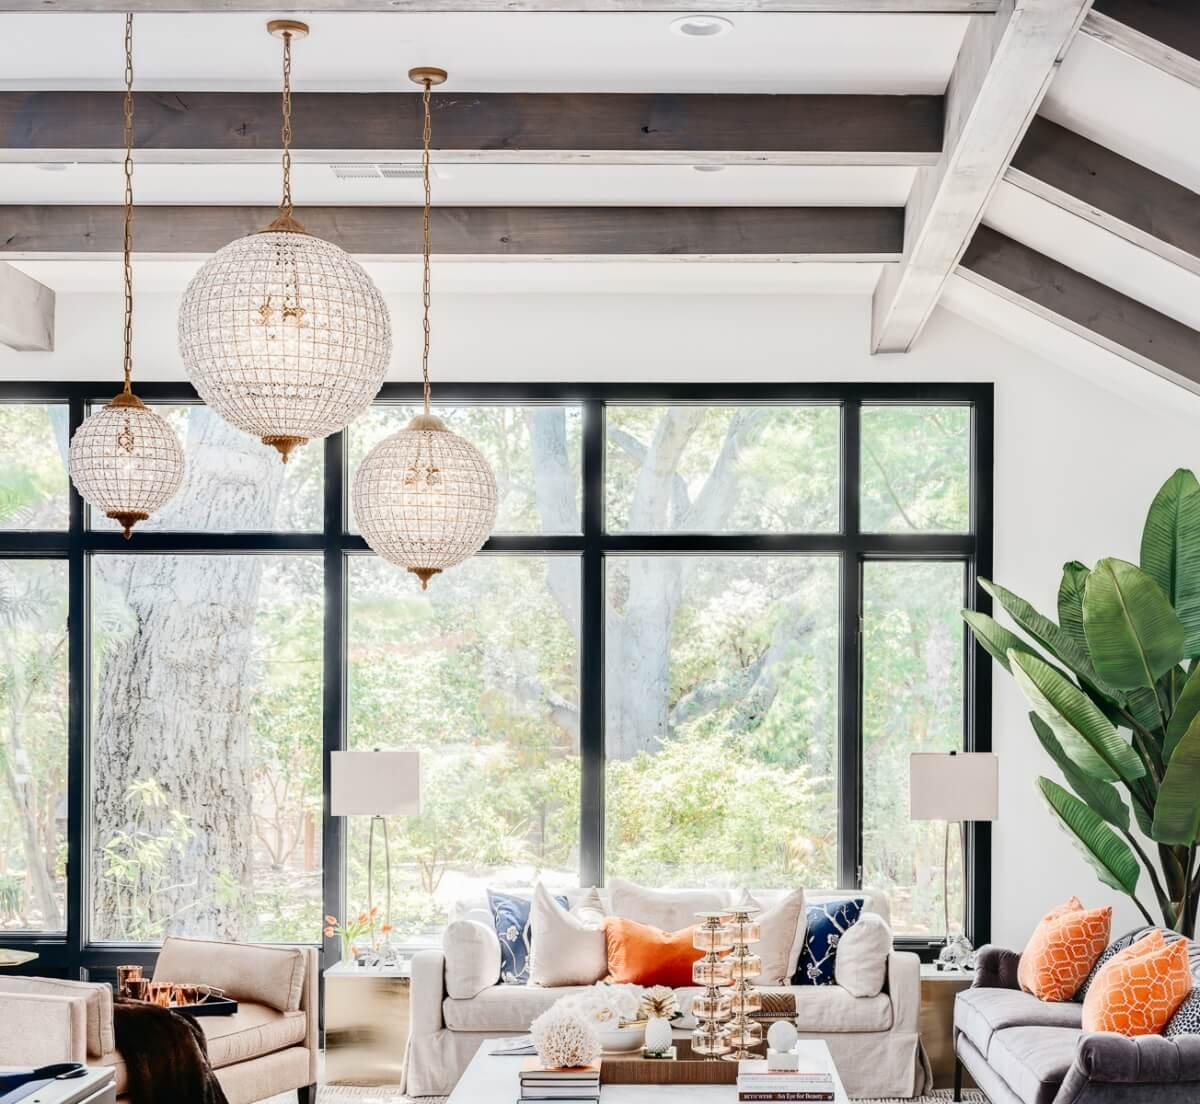 Large oversized circular pendant lighting in a very trending interior design.